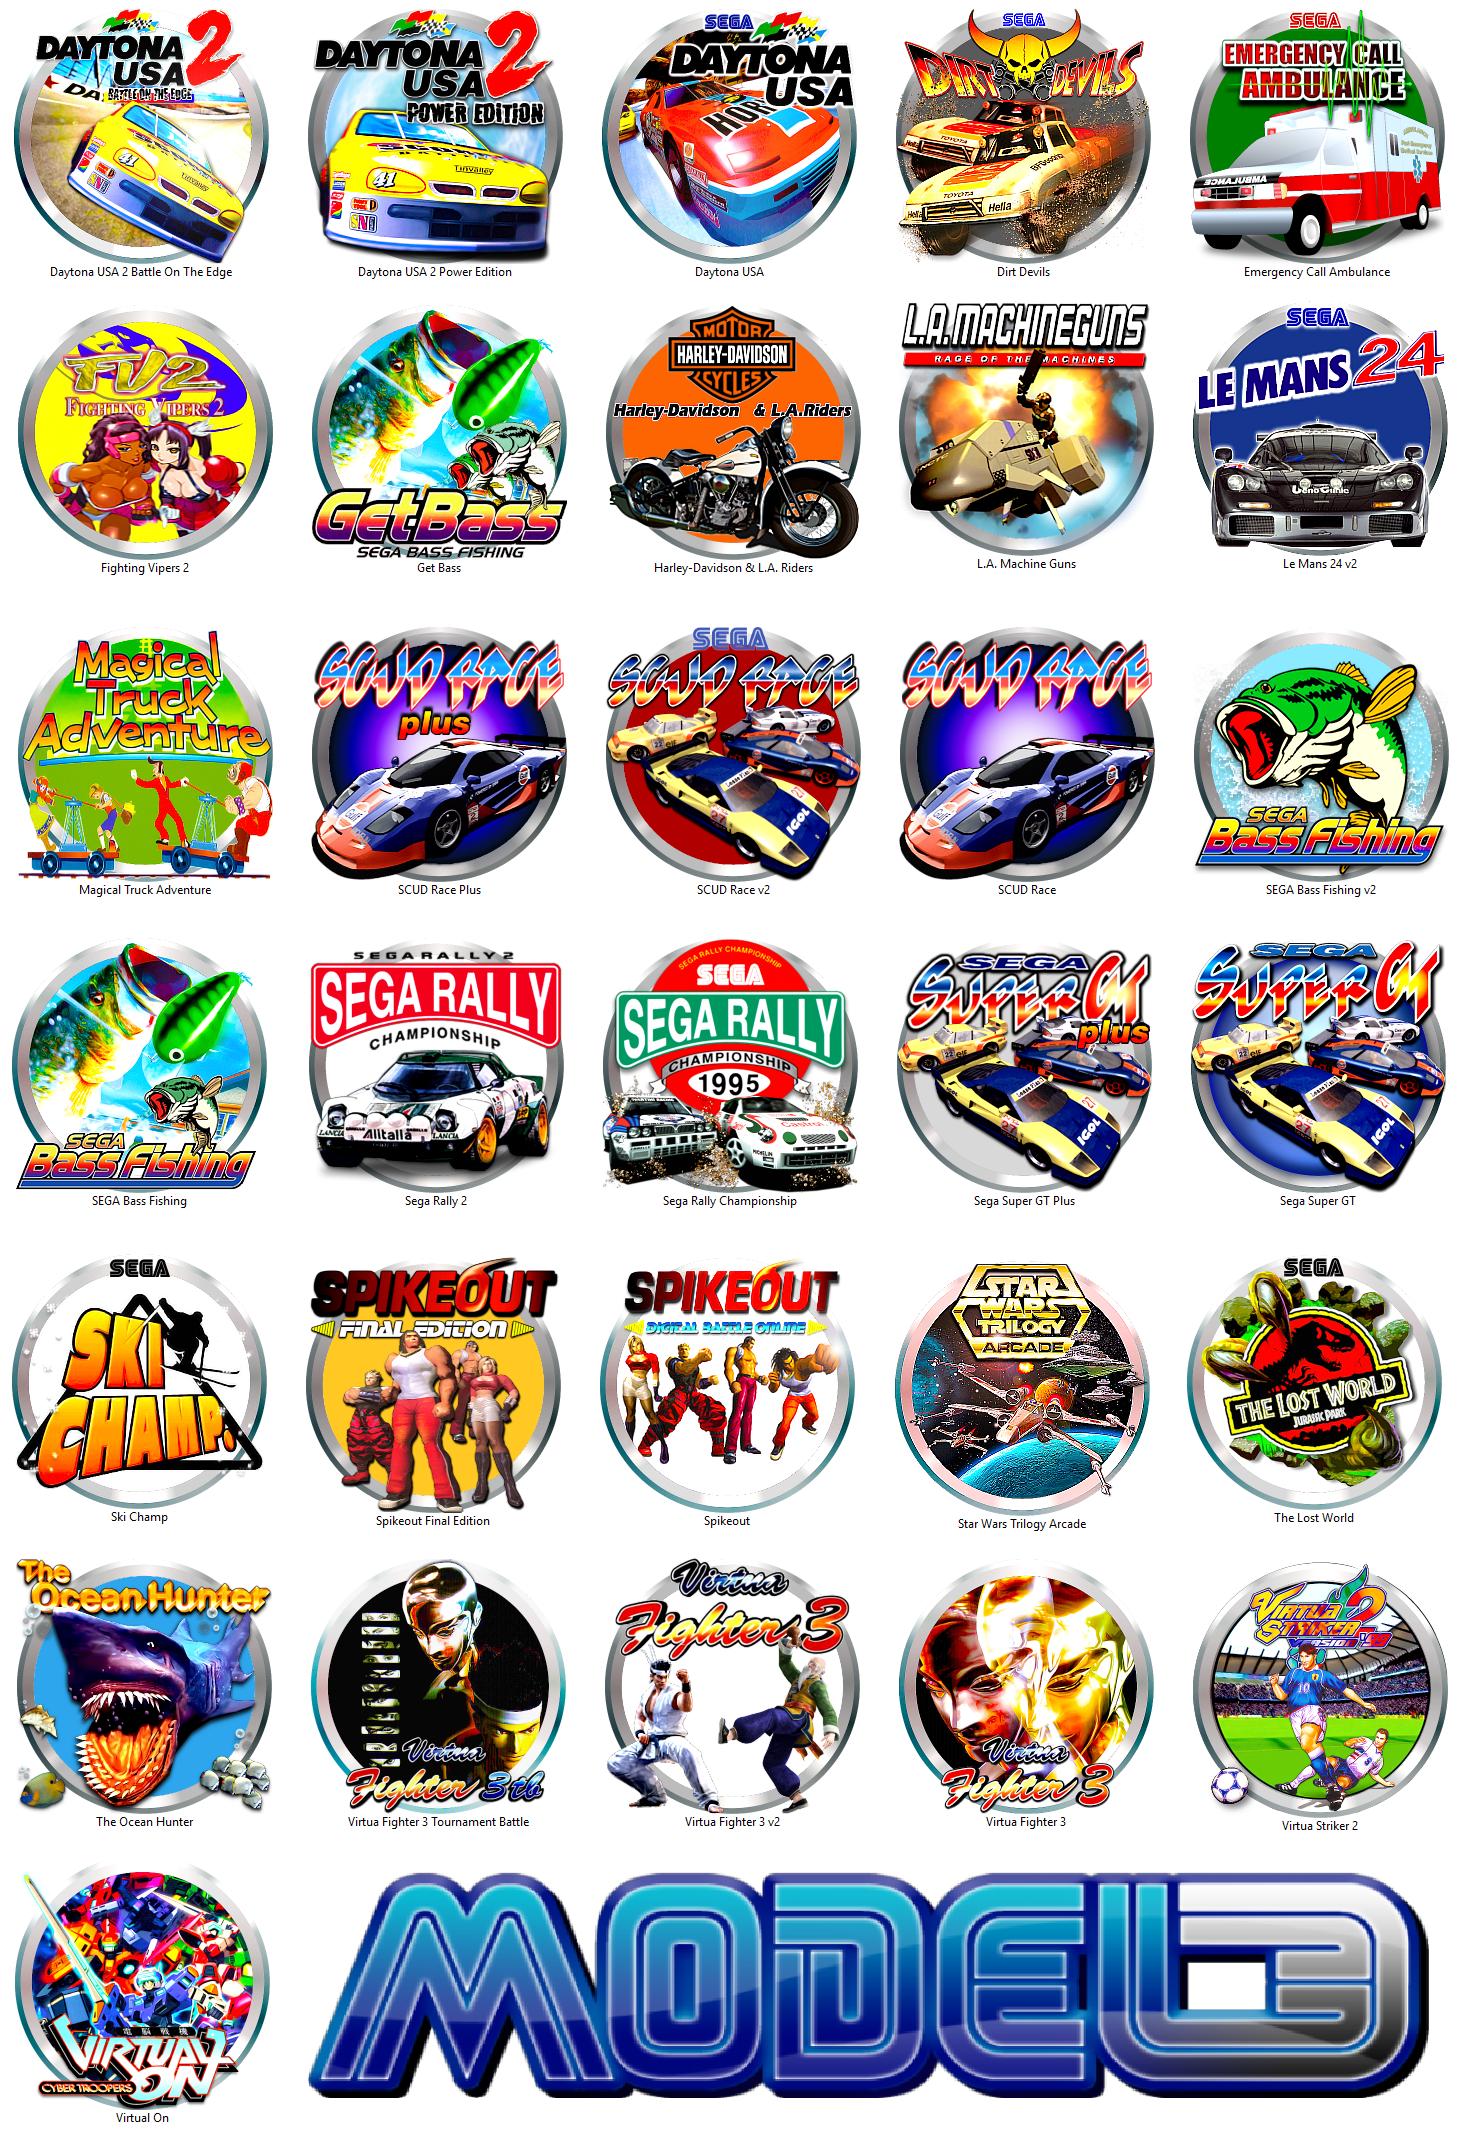 Real Estate Photos ⁓ Top Twelve Daytona Usa Rom Sega